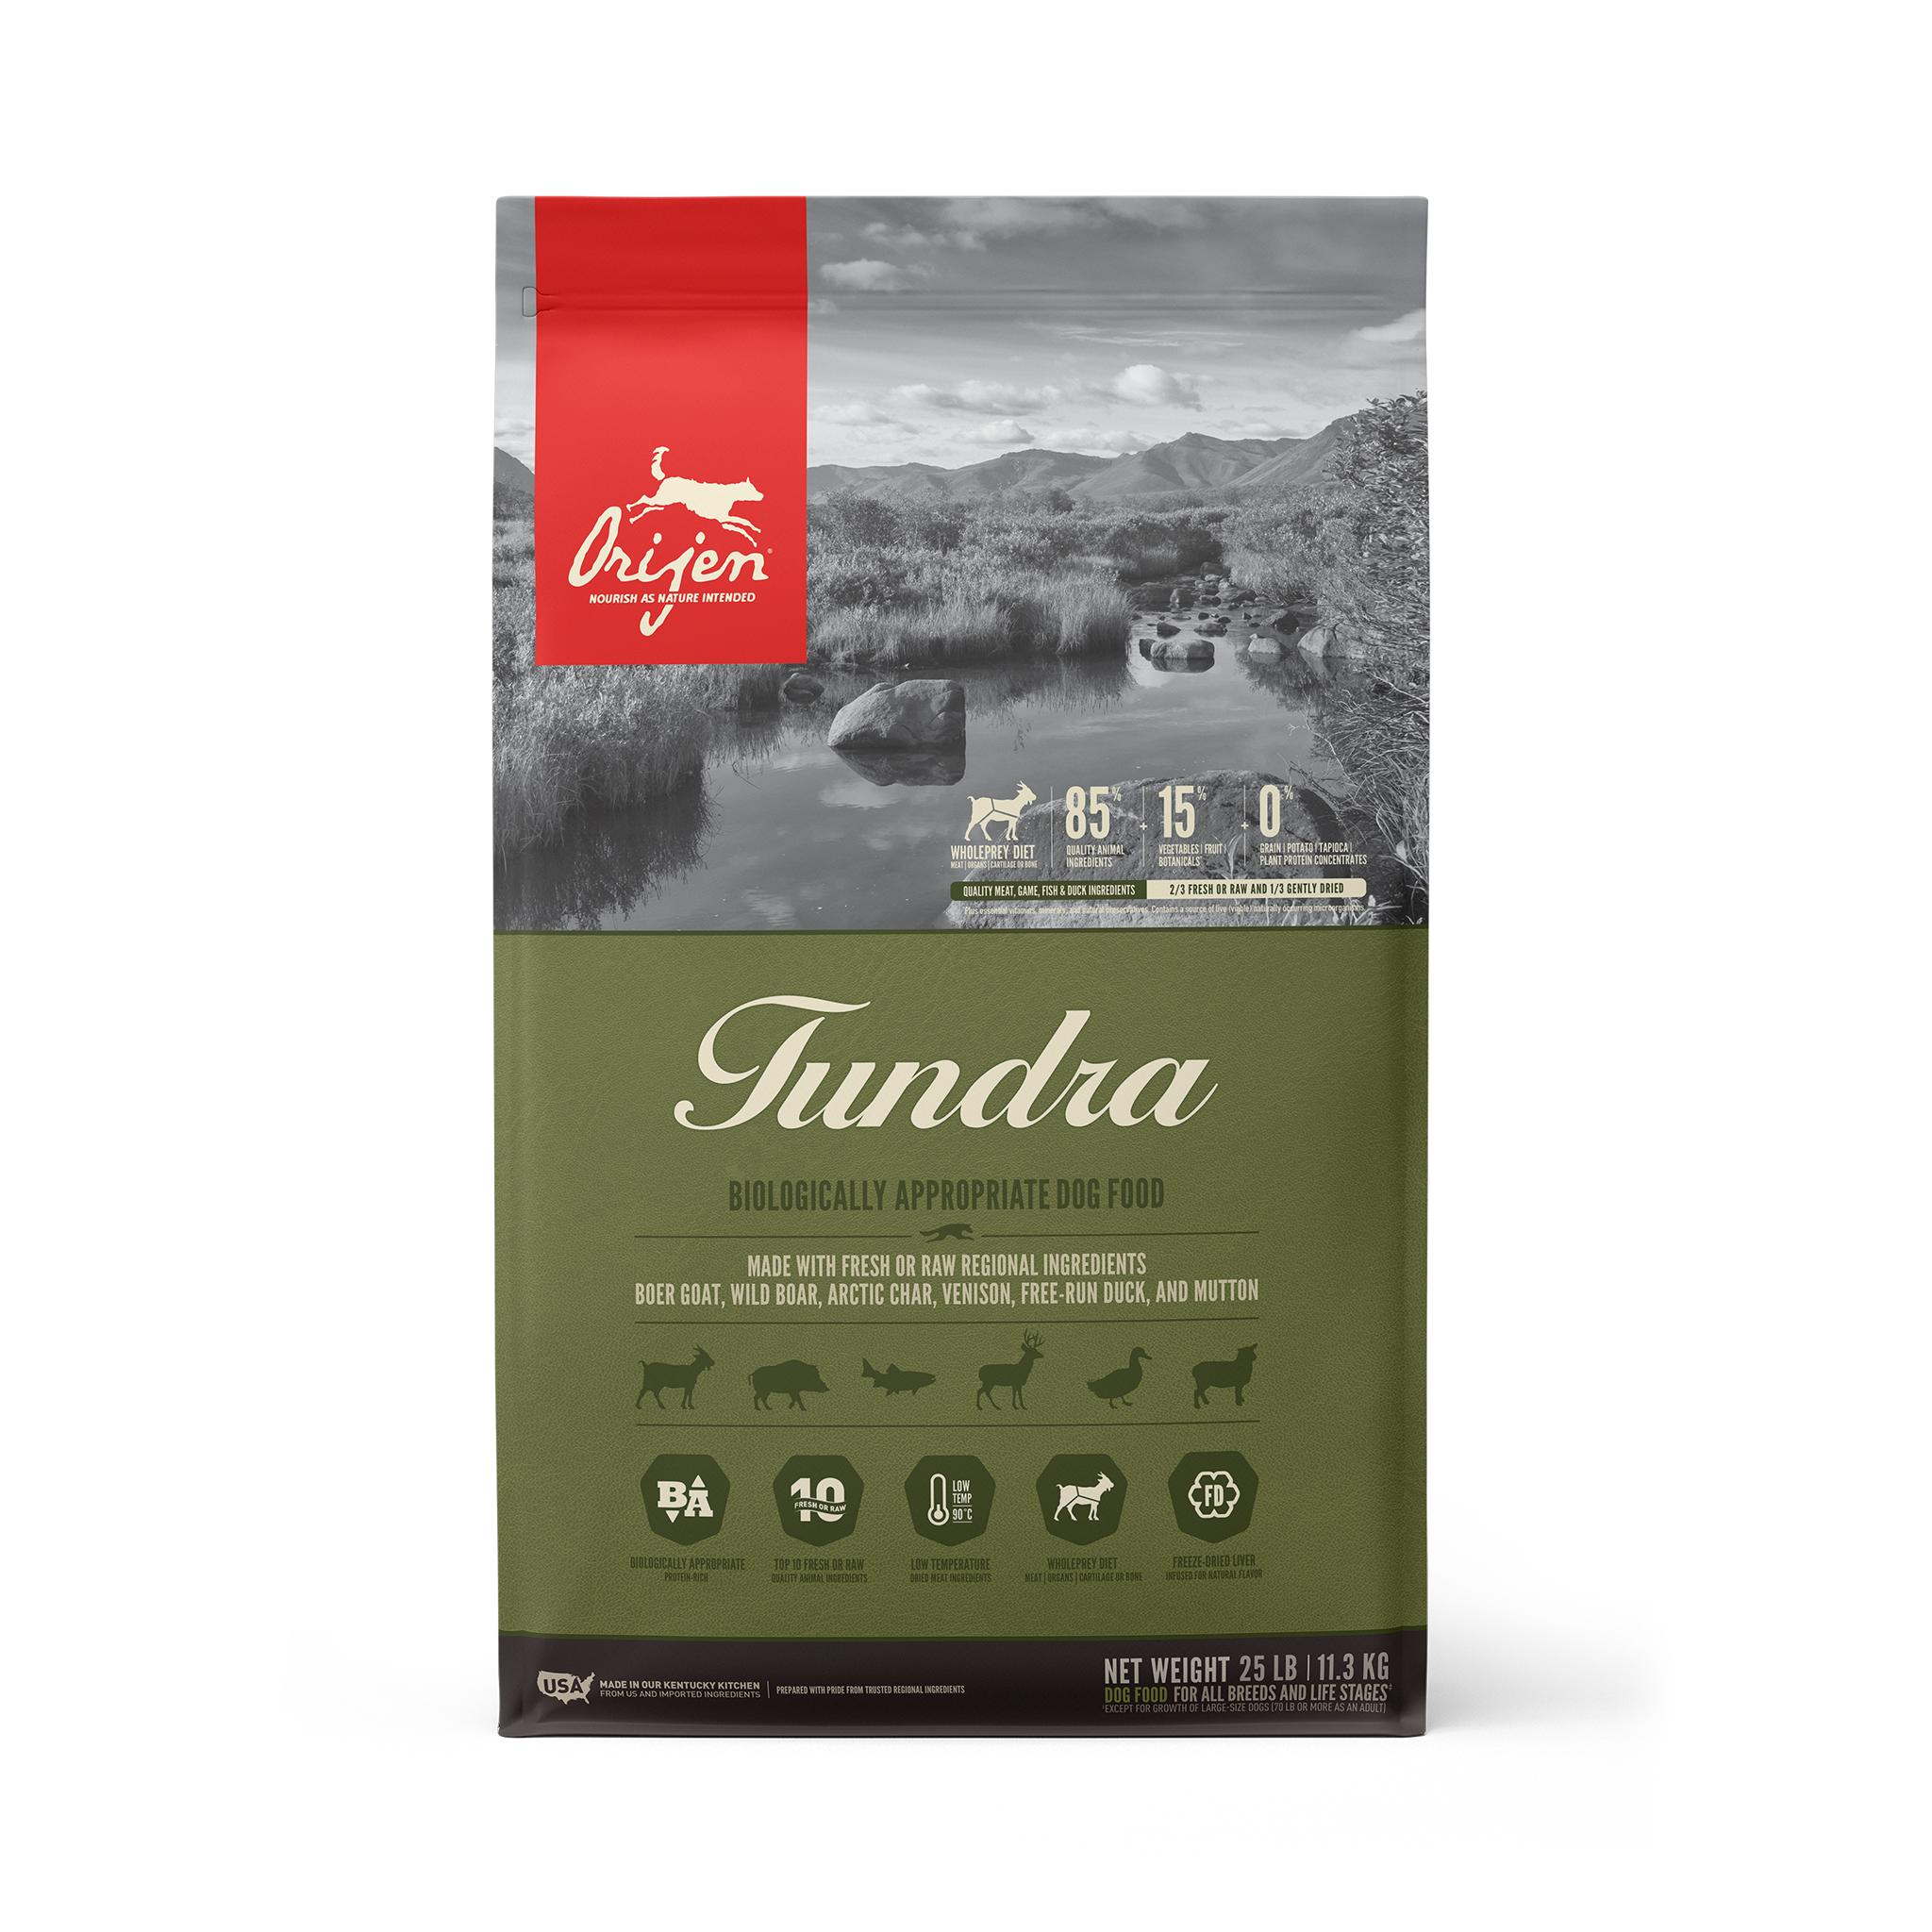 ORIJEN Tundra Grain-Free Dry Dog Food, 25-lb